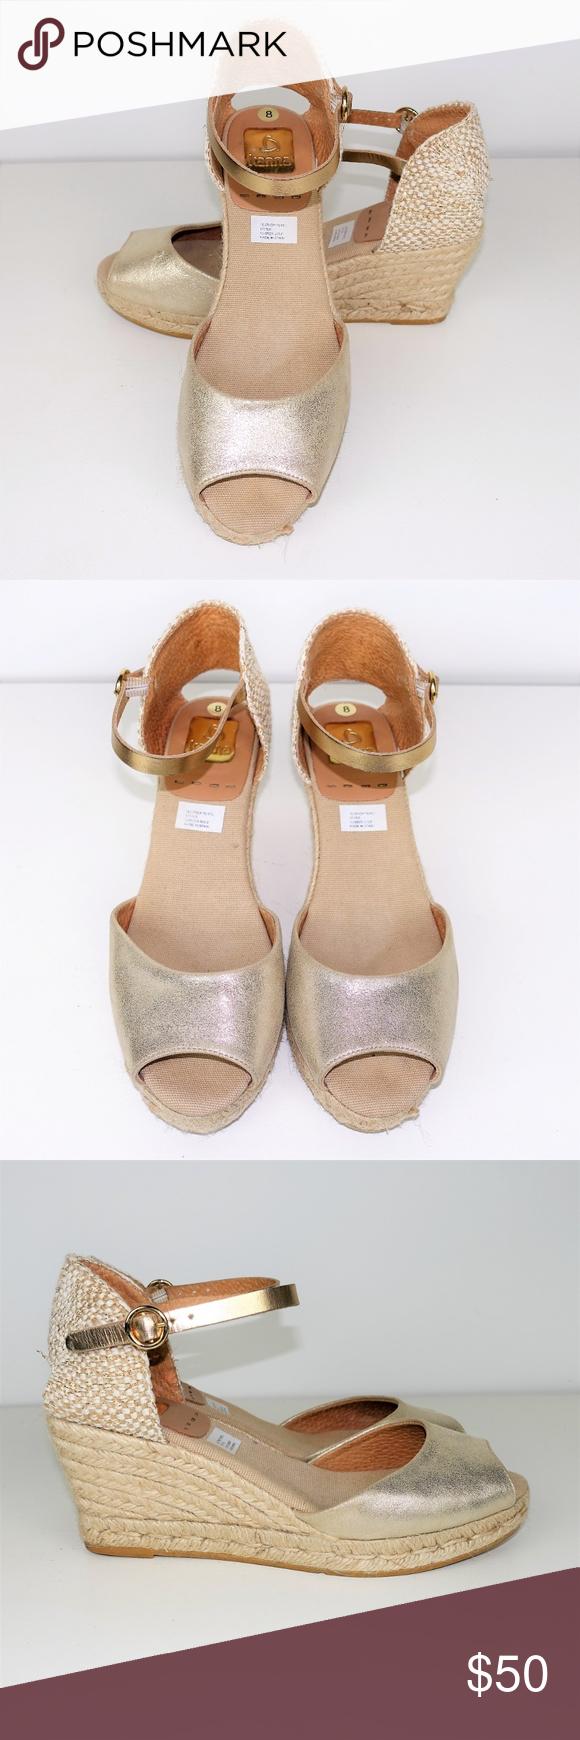 4c023fcec34 Kanna Evita Wedge Espadrille Sandals Leather Kanna Evita Wedge Espadrille  Sandals Leather Buckle Ankle Strap Gold